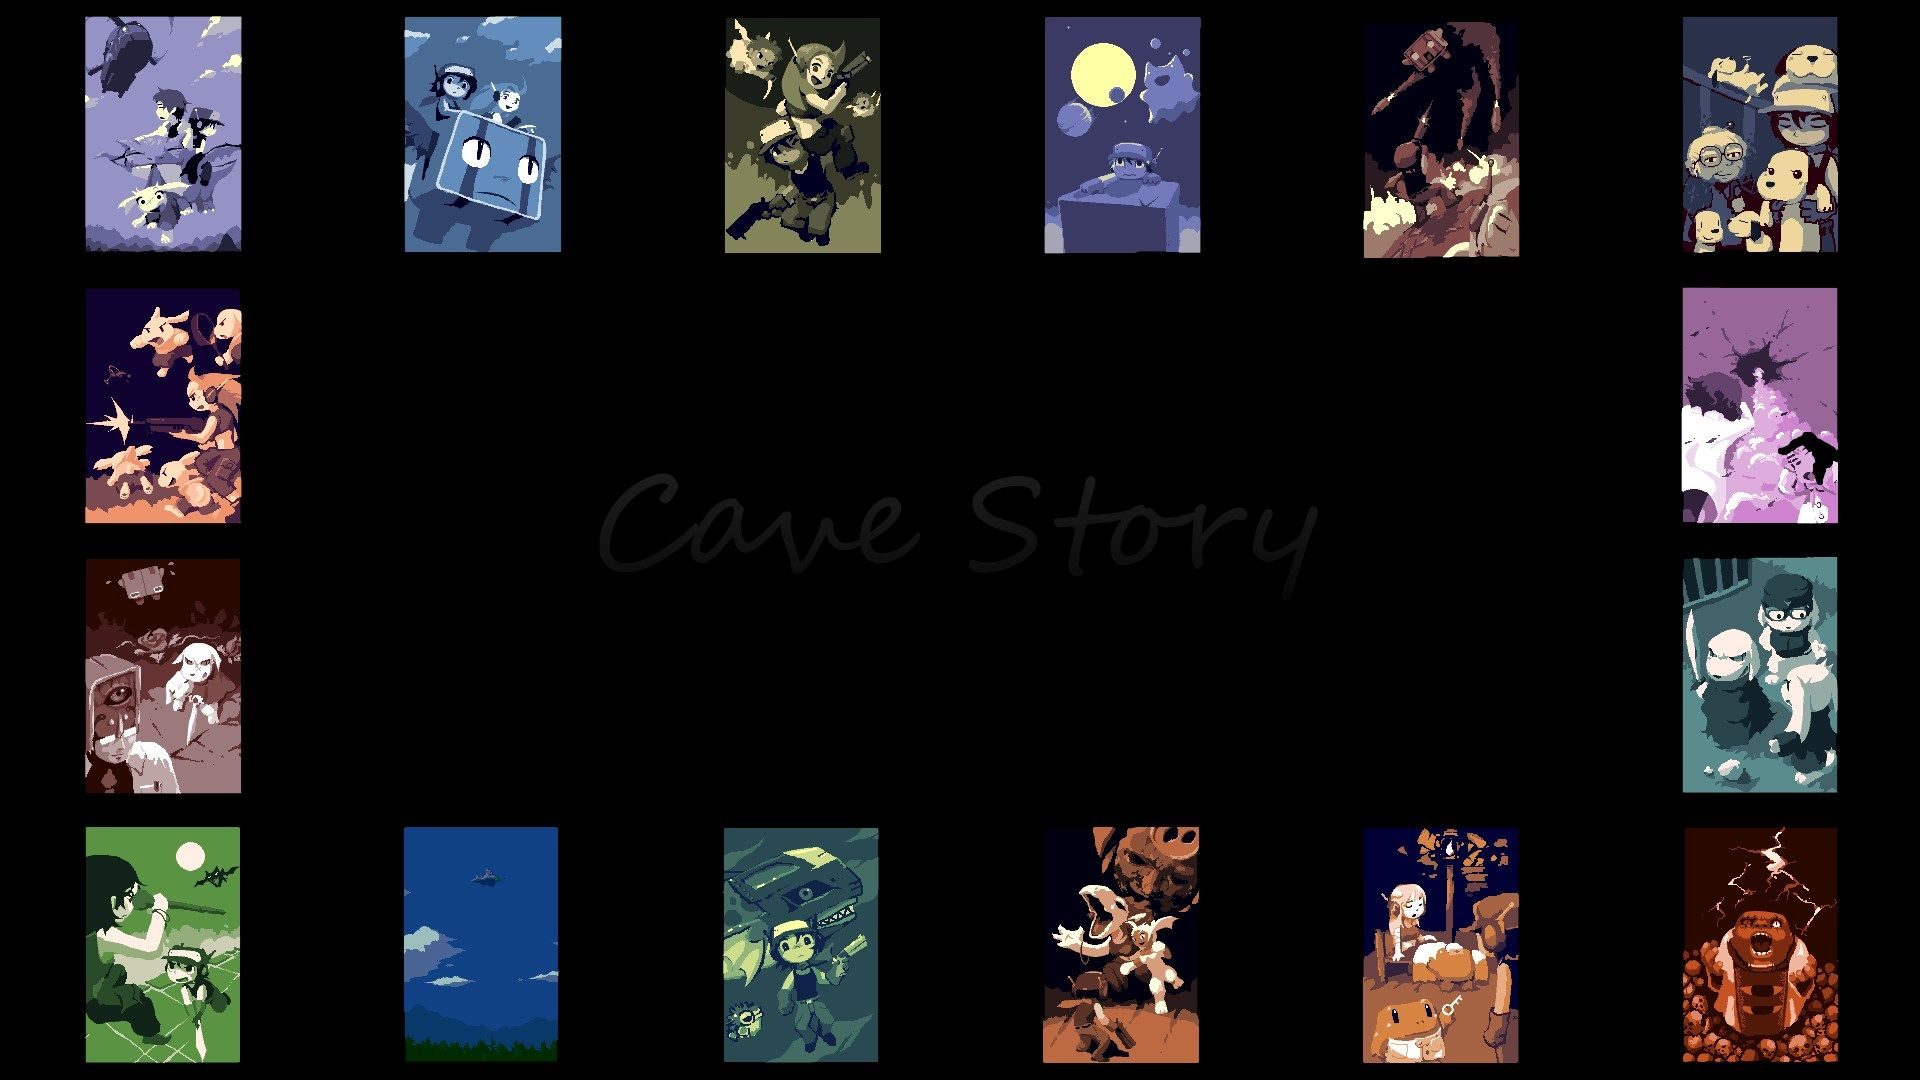 Hq Definition Wallpaper Desktop Cave Story Backround Duke Butler 2017 03 03 Cave Story Cave Desktop Wallpaper